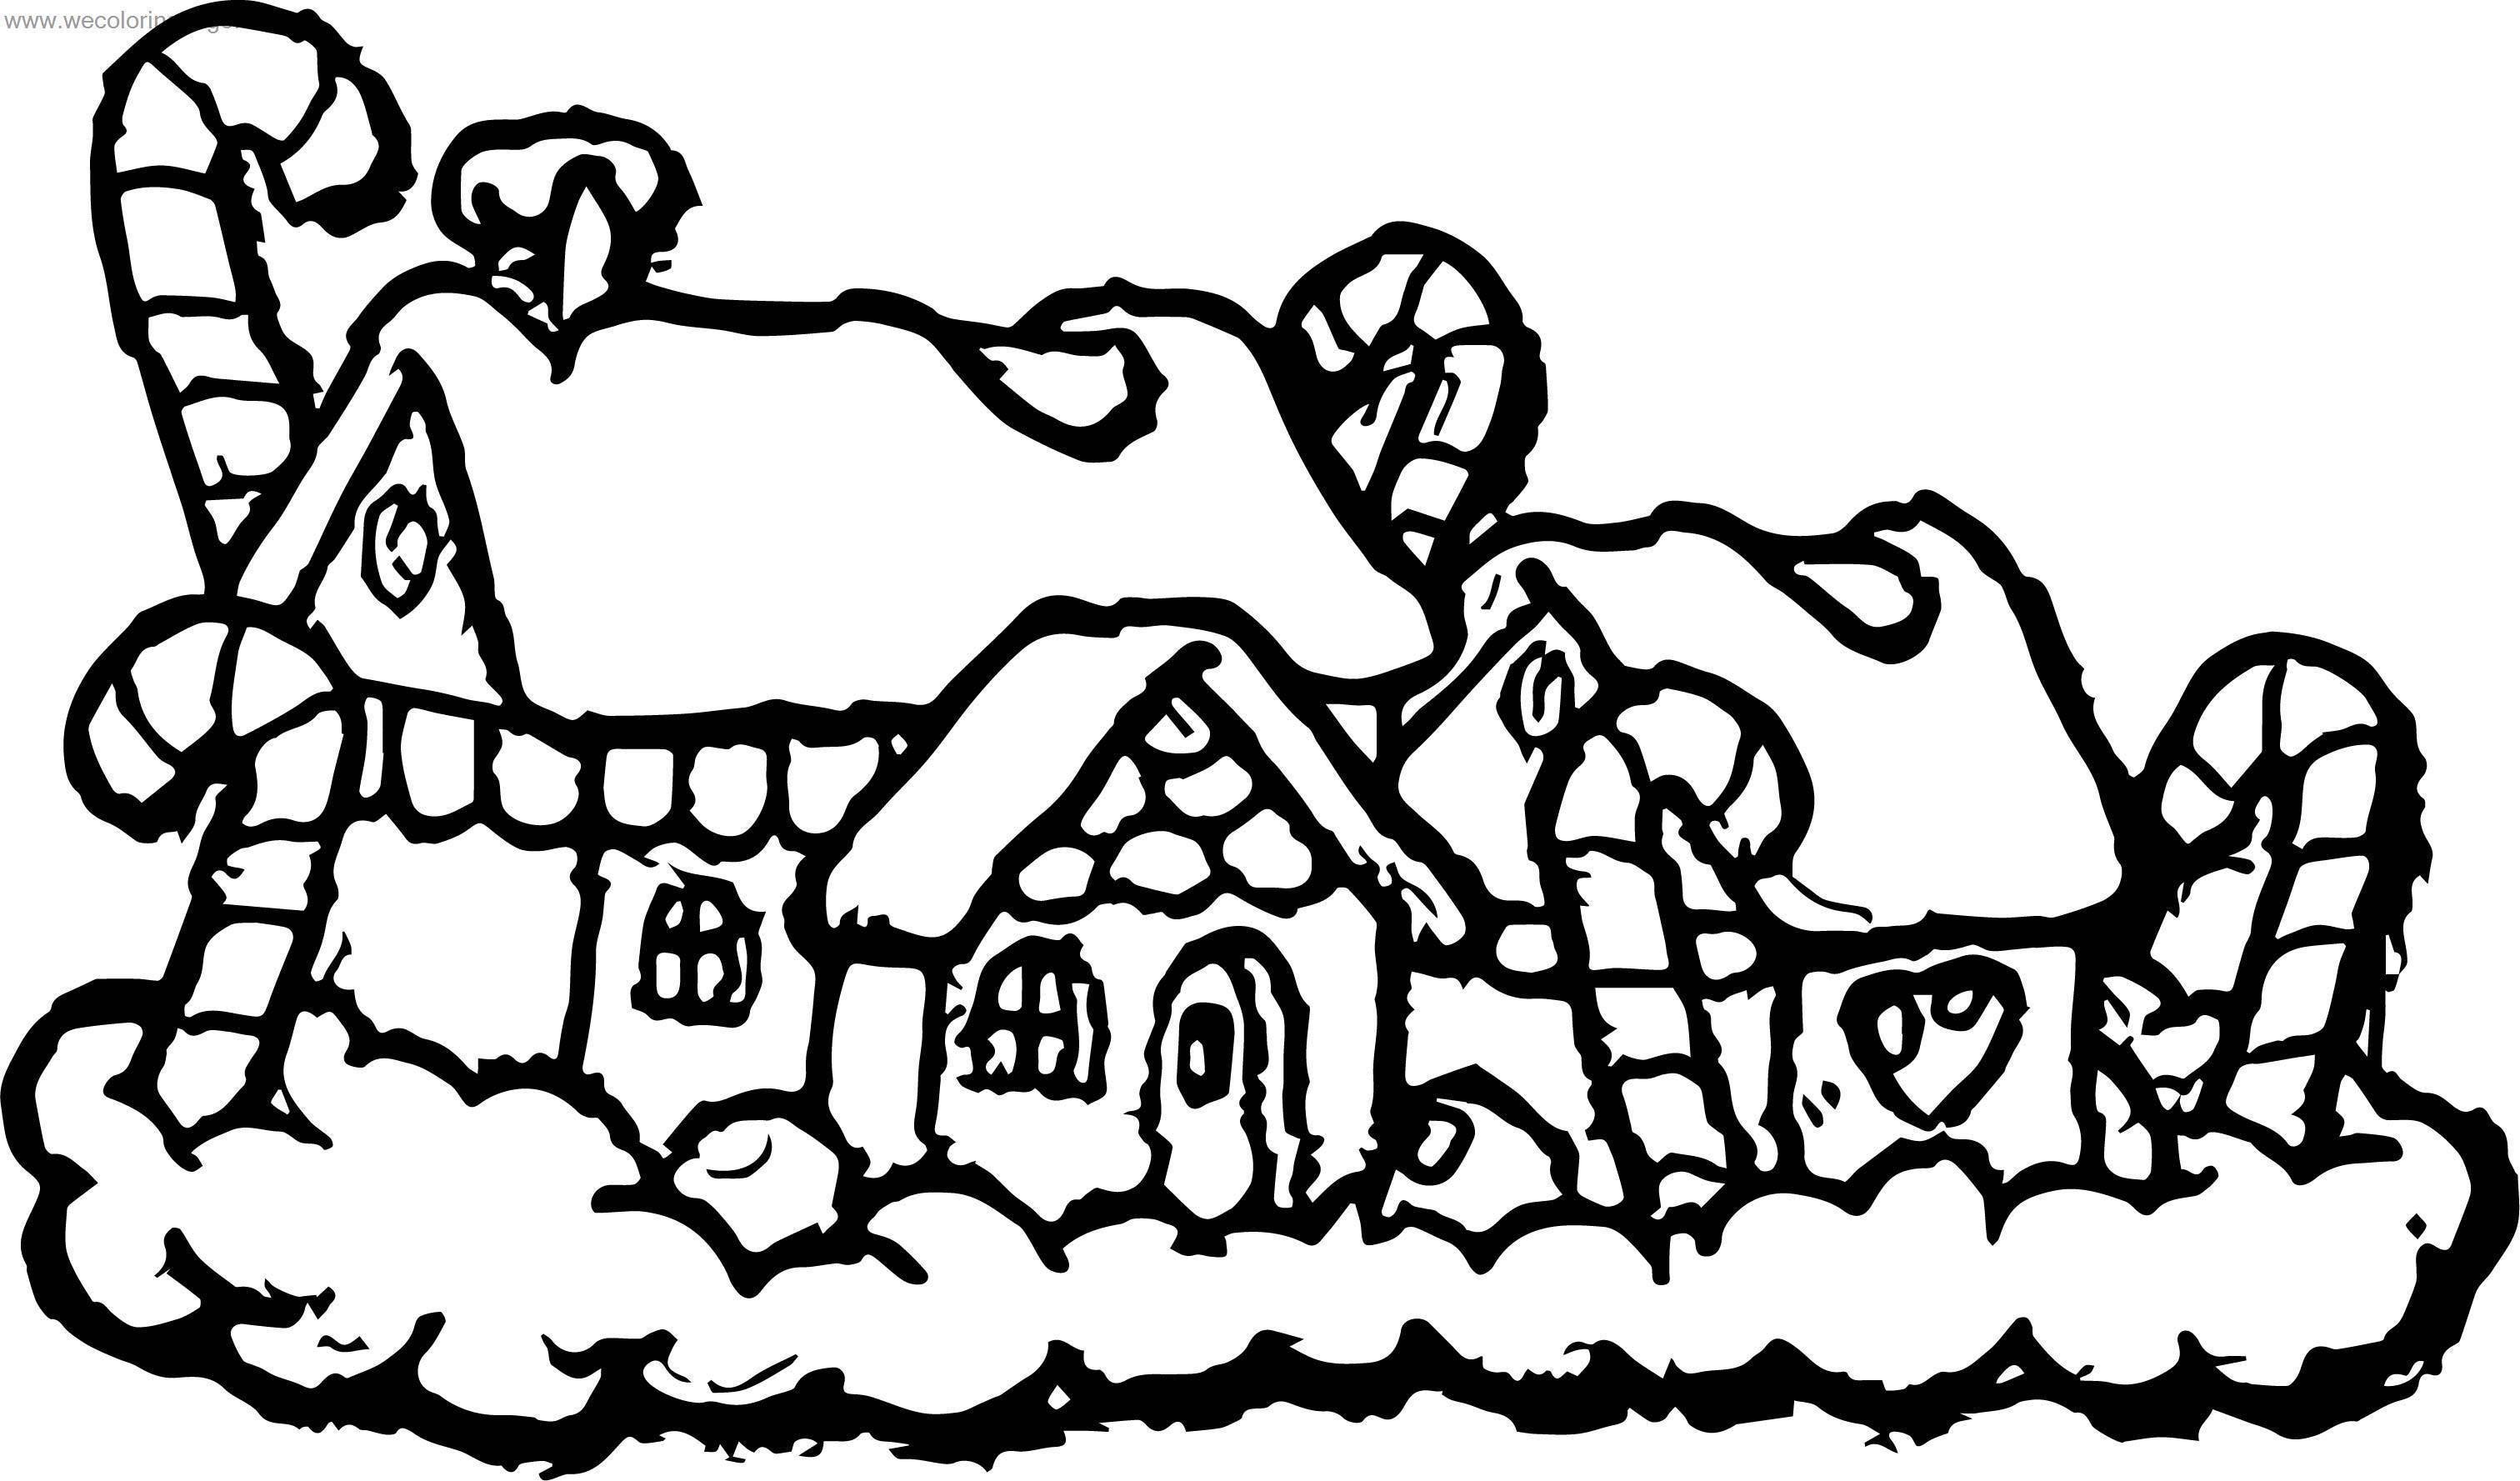 Chrismas Gingerbread House Coloring Page | Wecoloringpage.com